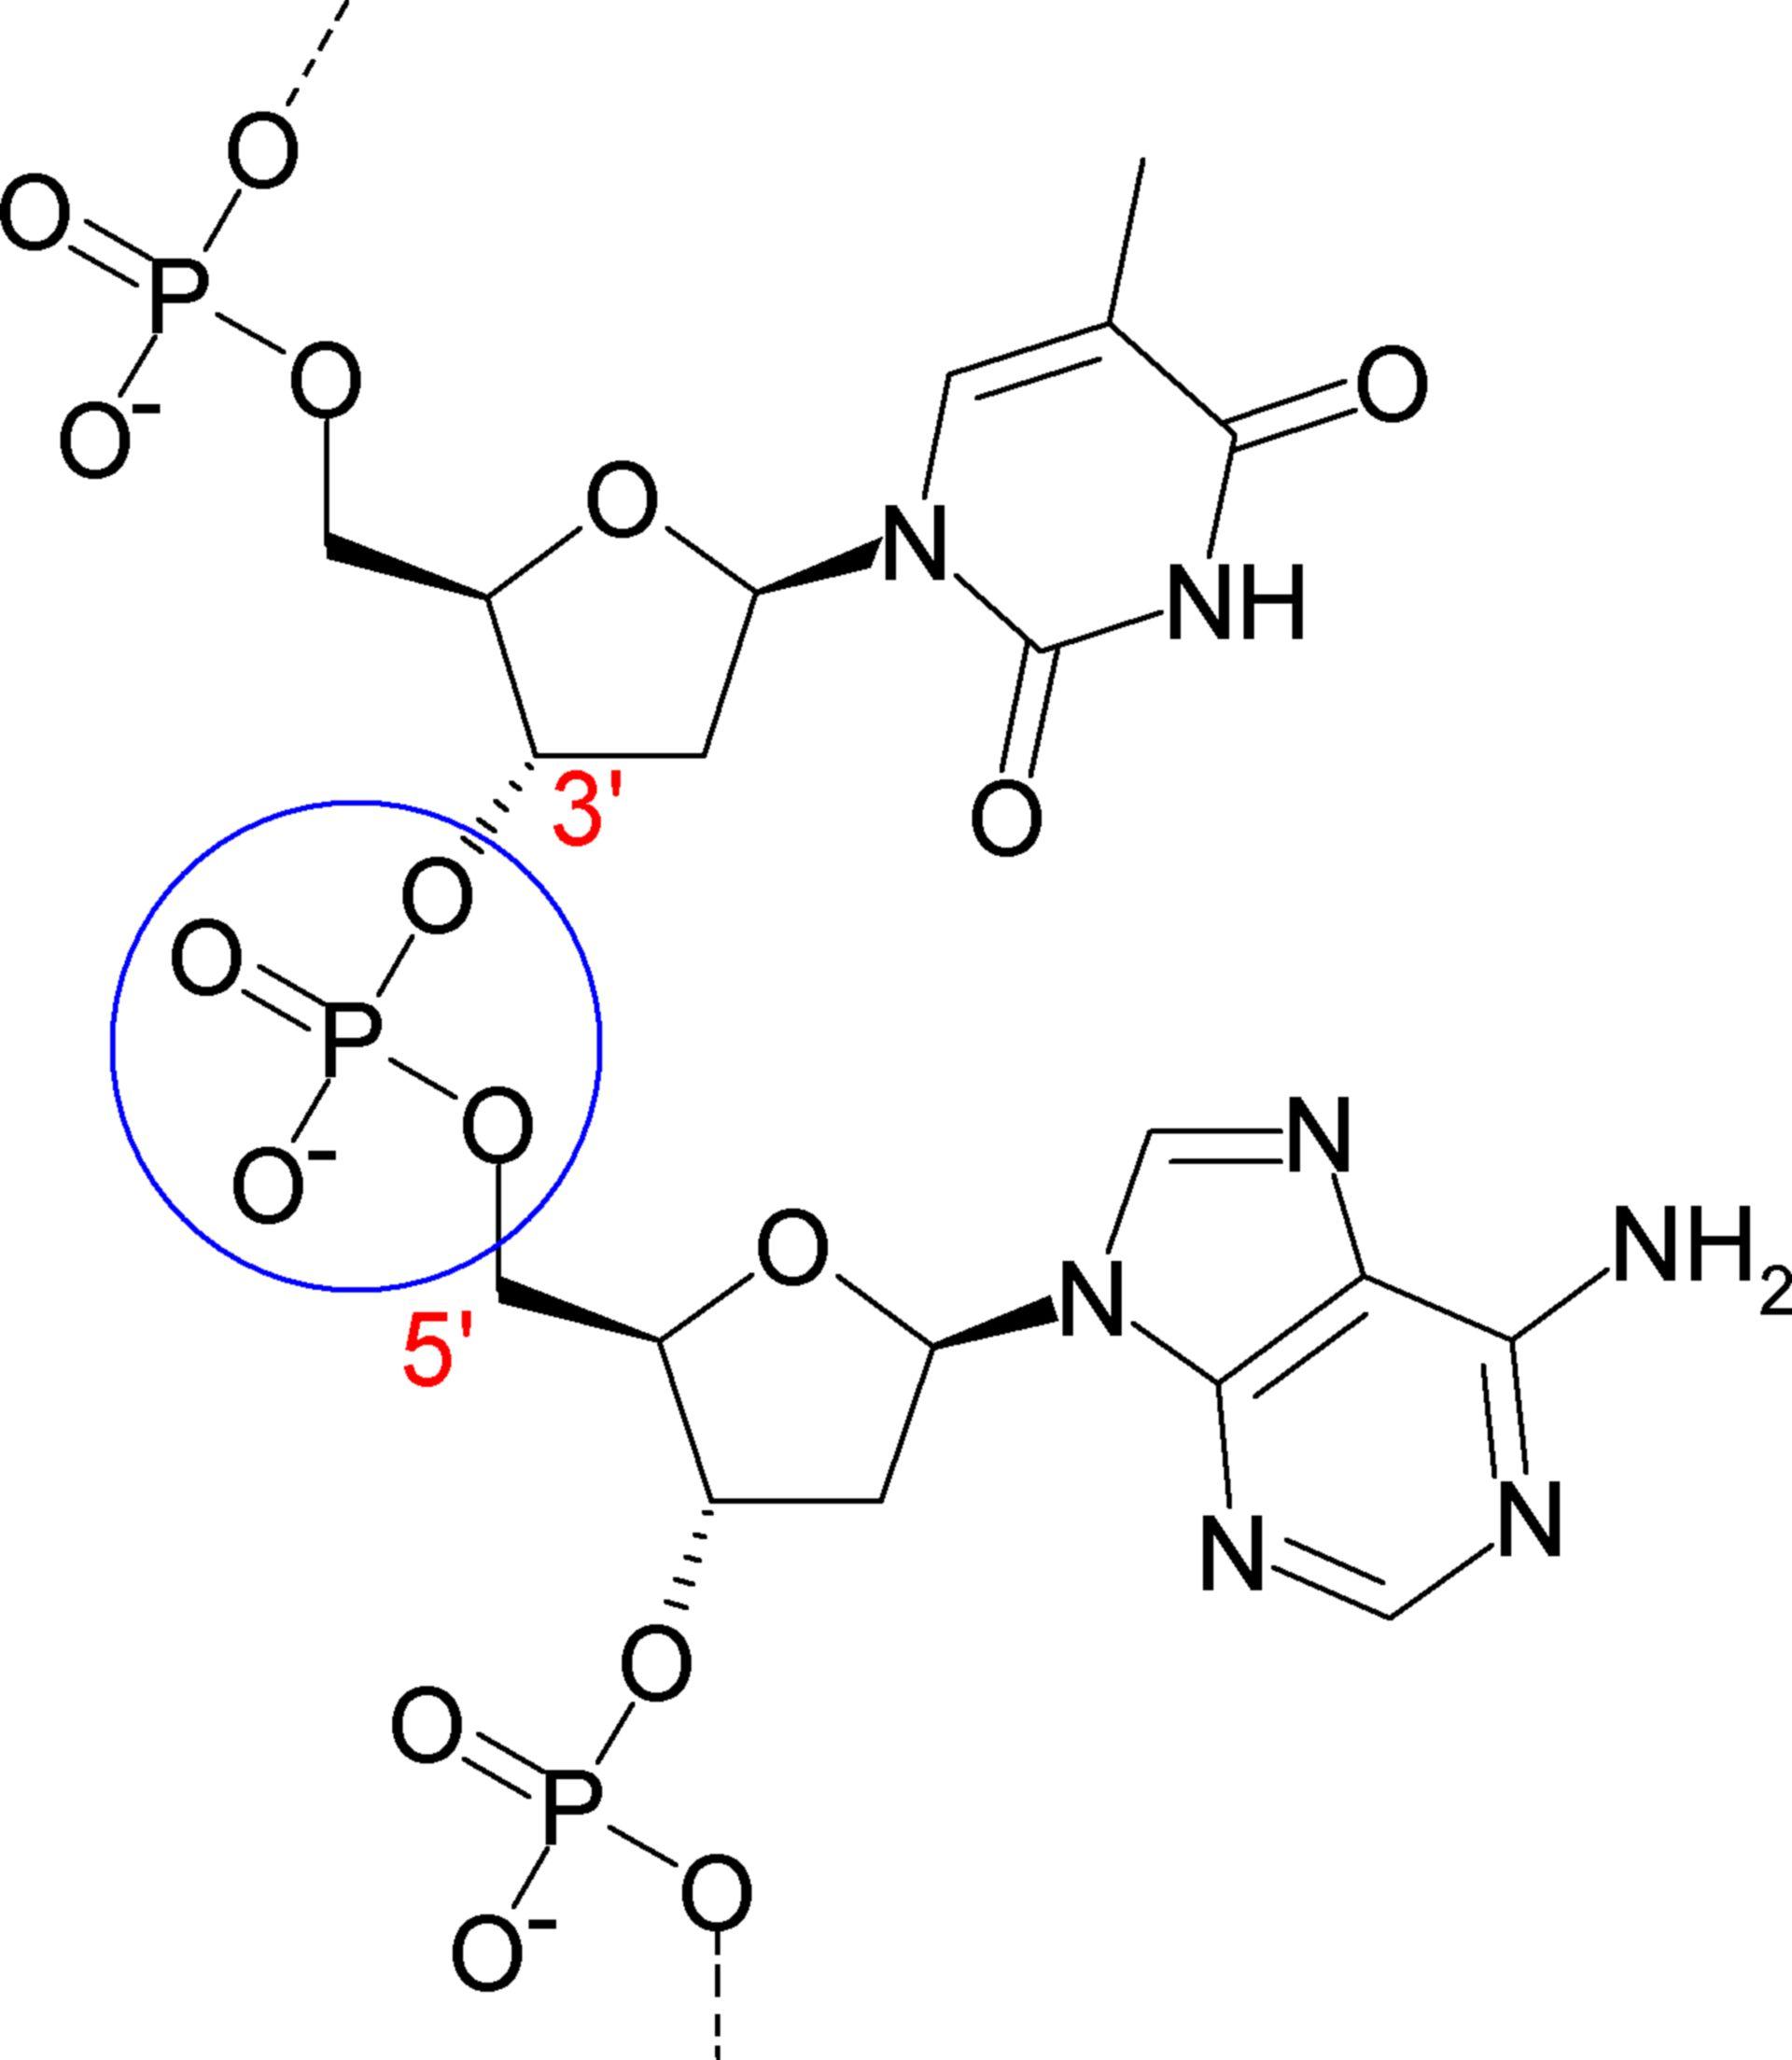 Phosphodiesterbindung